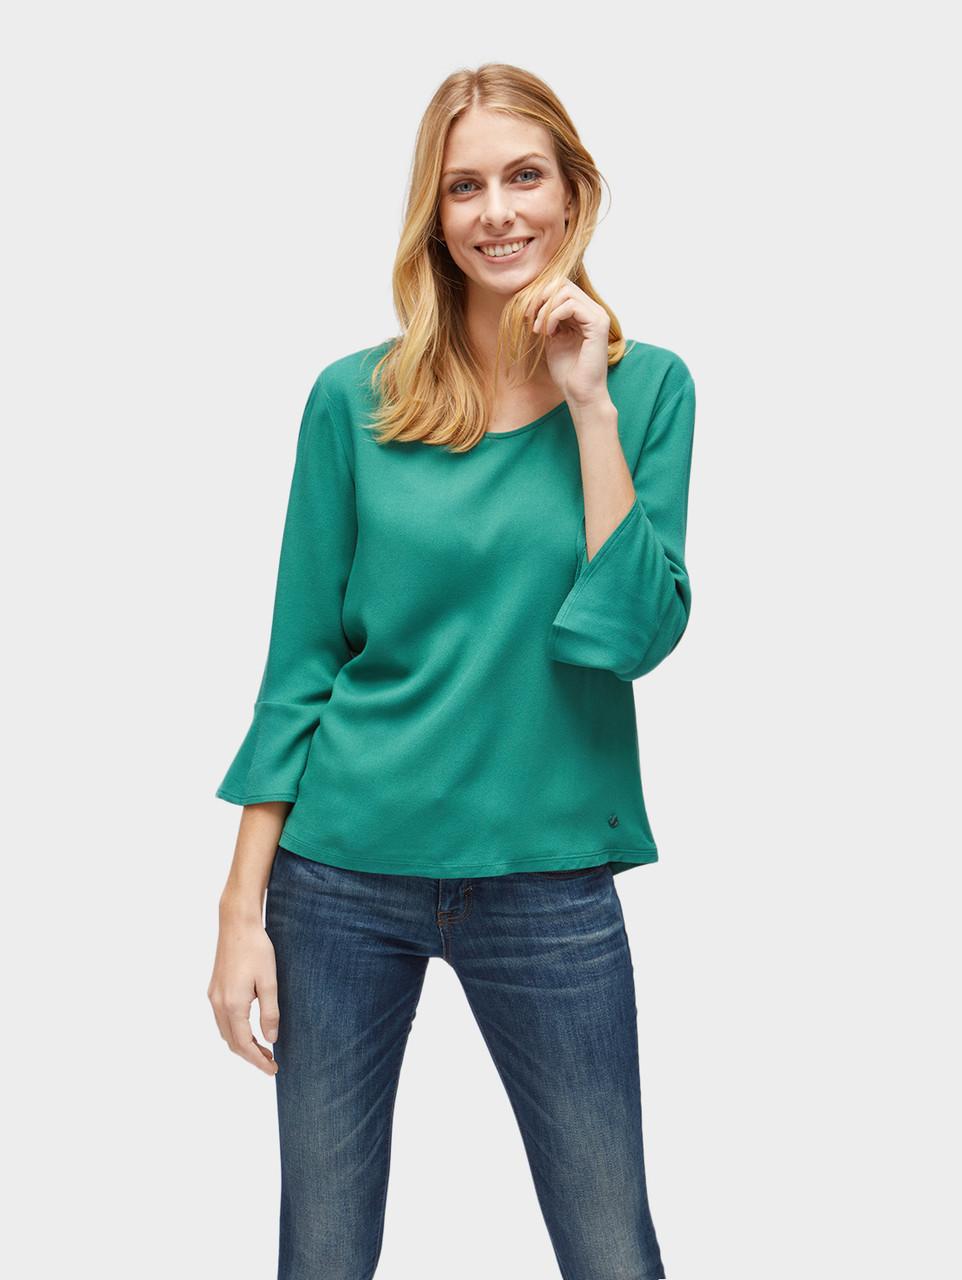 Блуза Tom Tailor 10392040970 L Зеленый